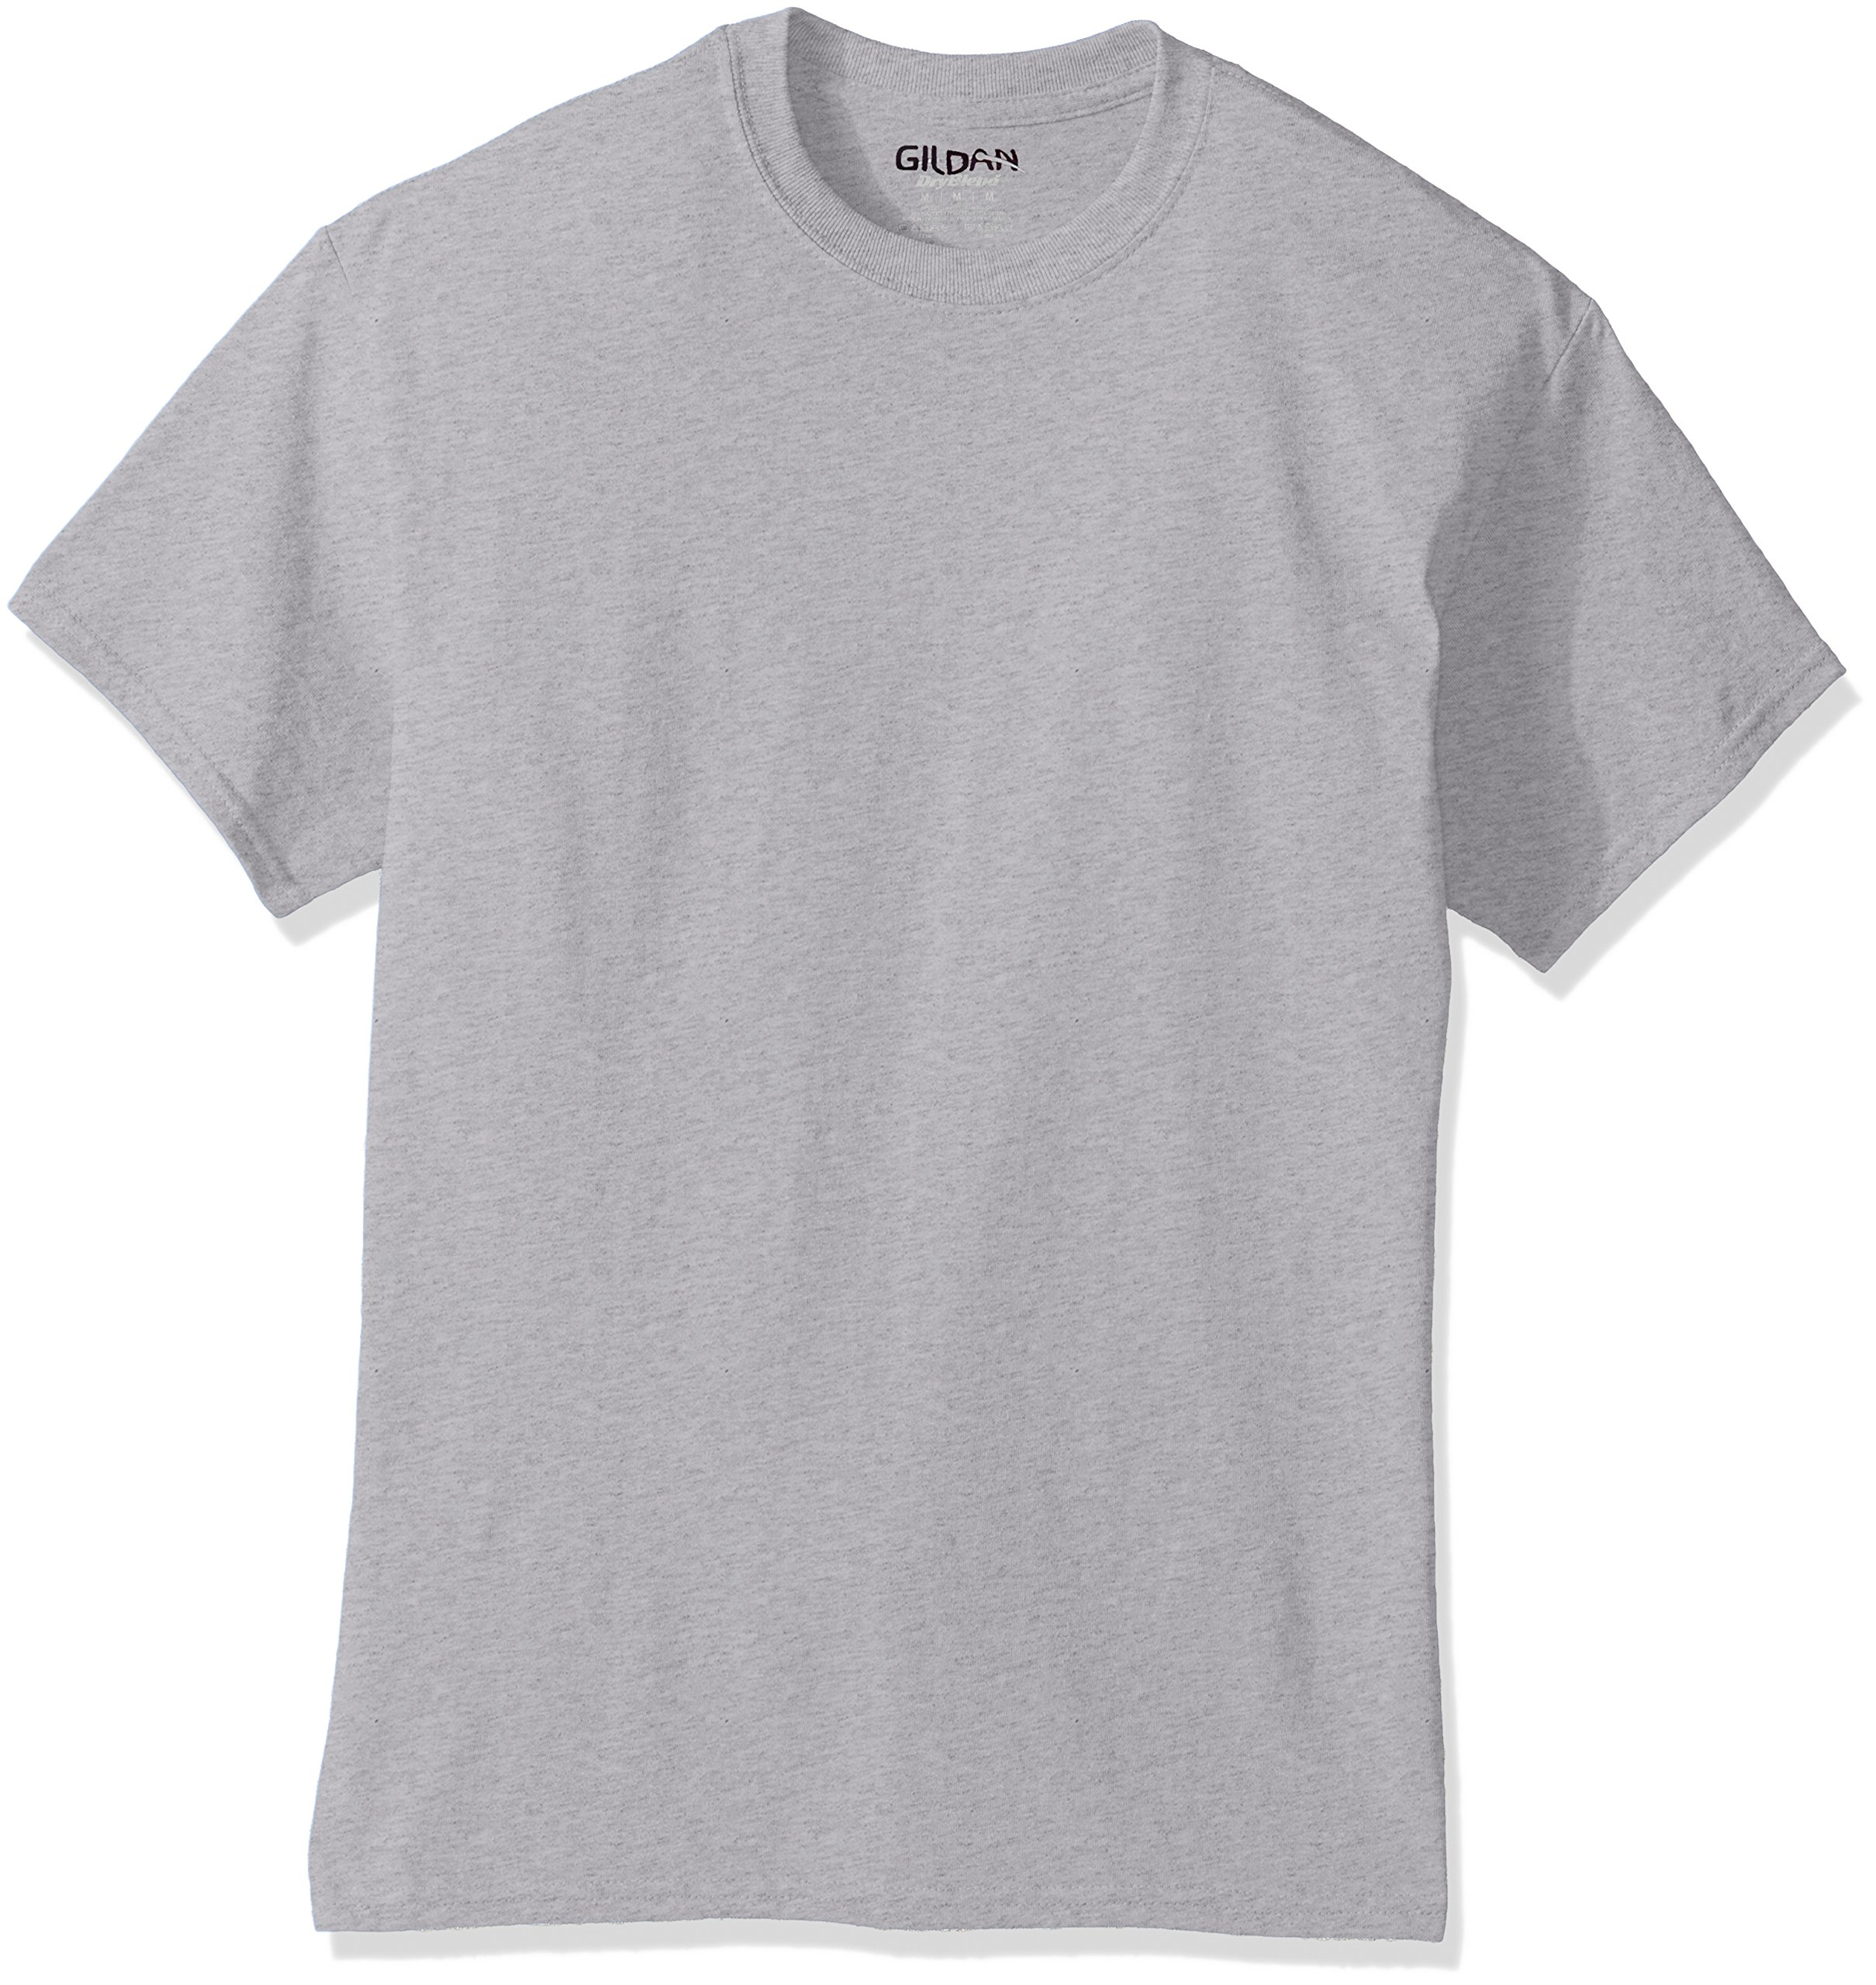 Gildan Men's DryBlend Classic T-Shirt, Ash Grey Large